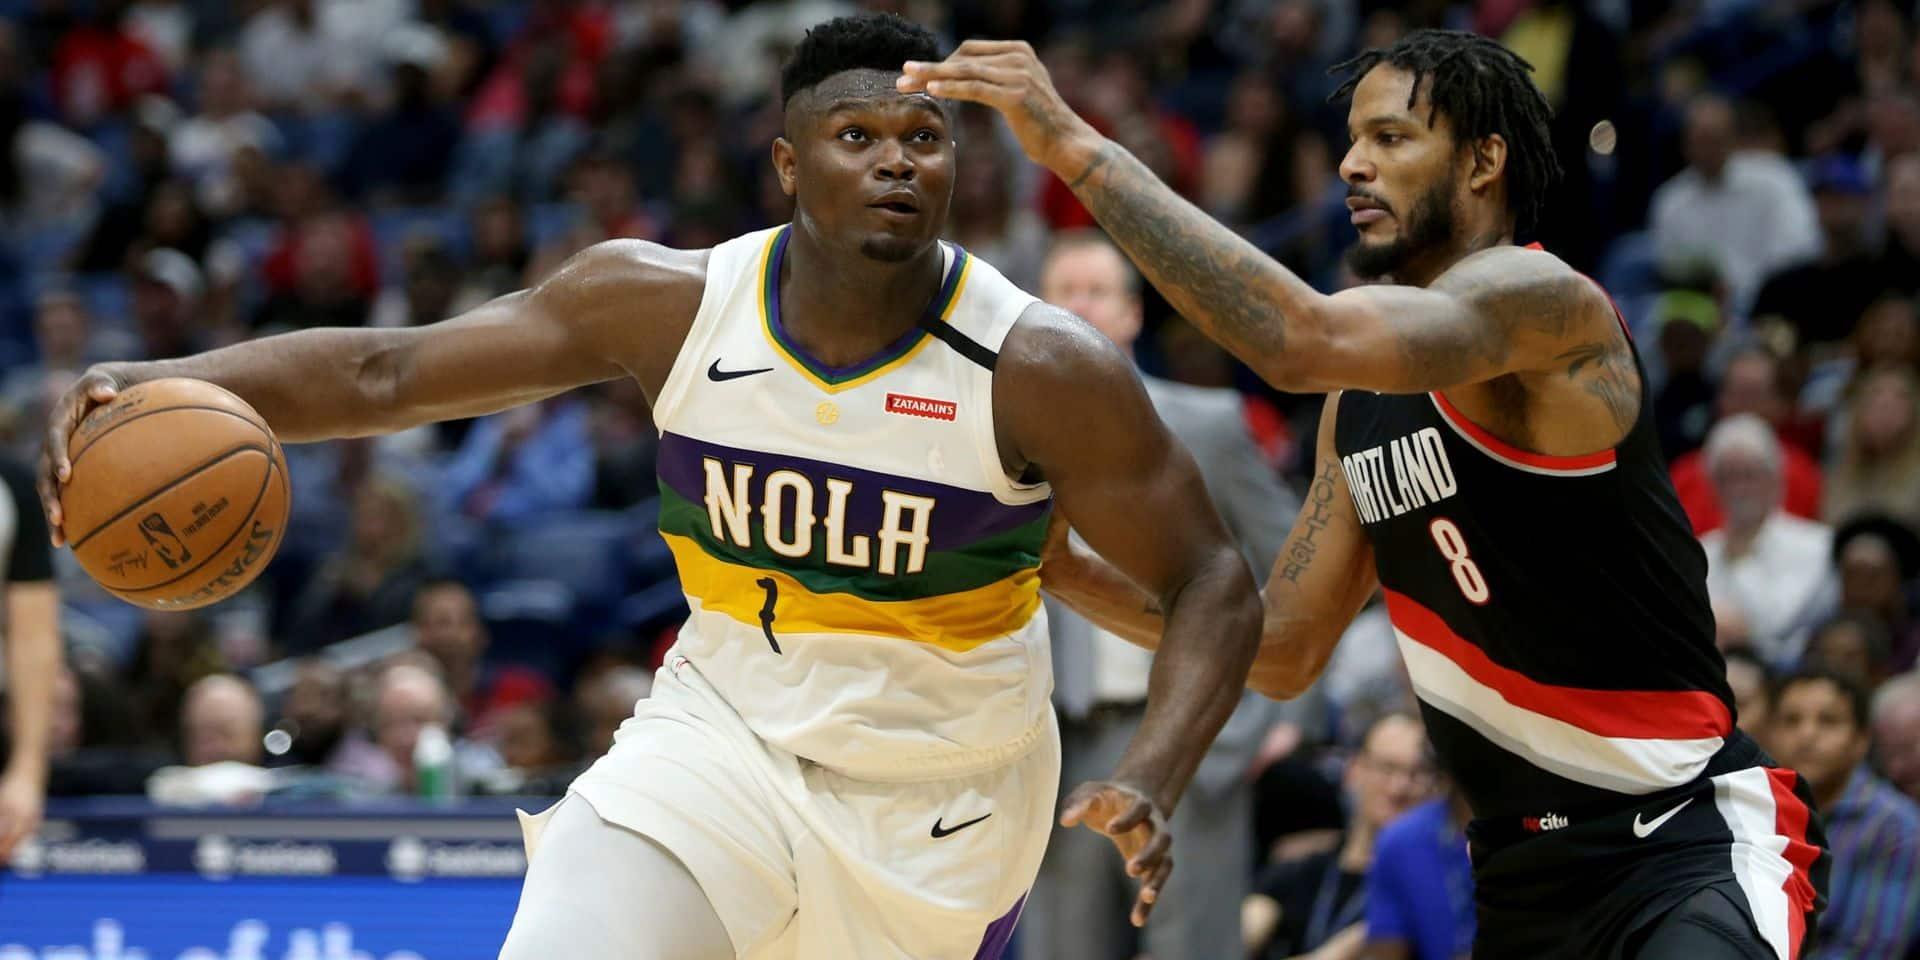 NBA: Williamson écrase Portland, Simmons fait tomber les Clippers